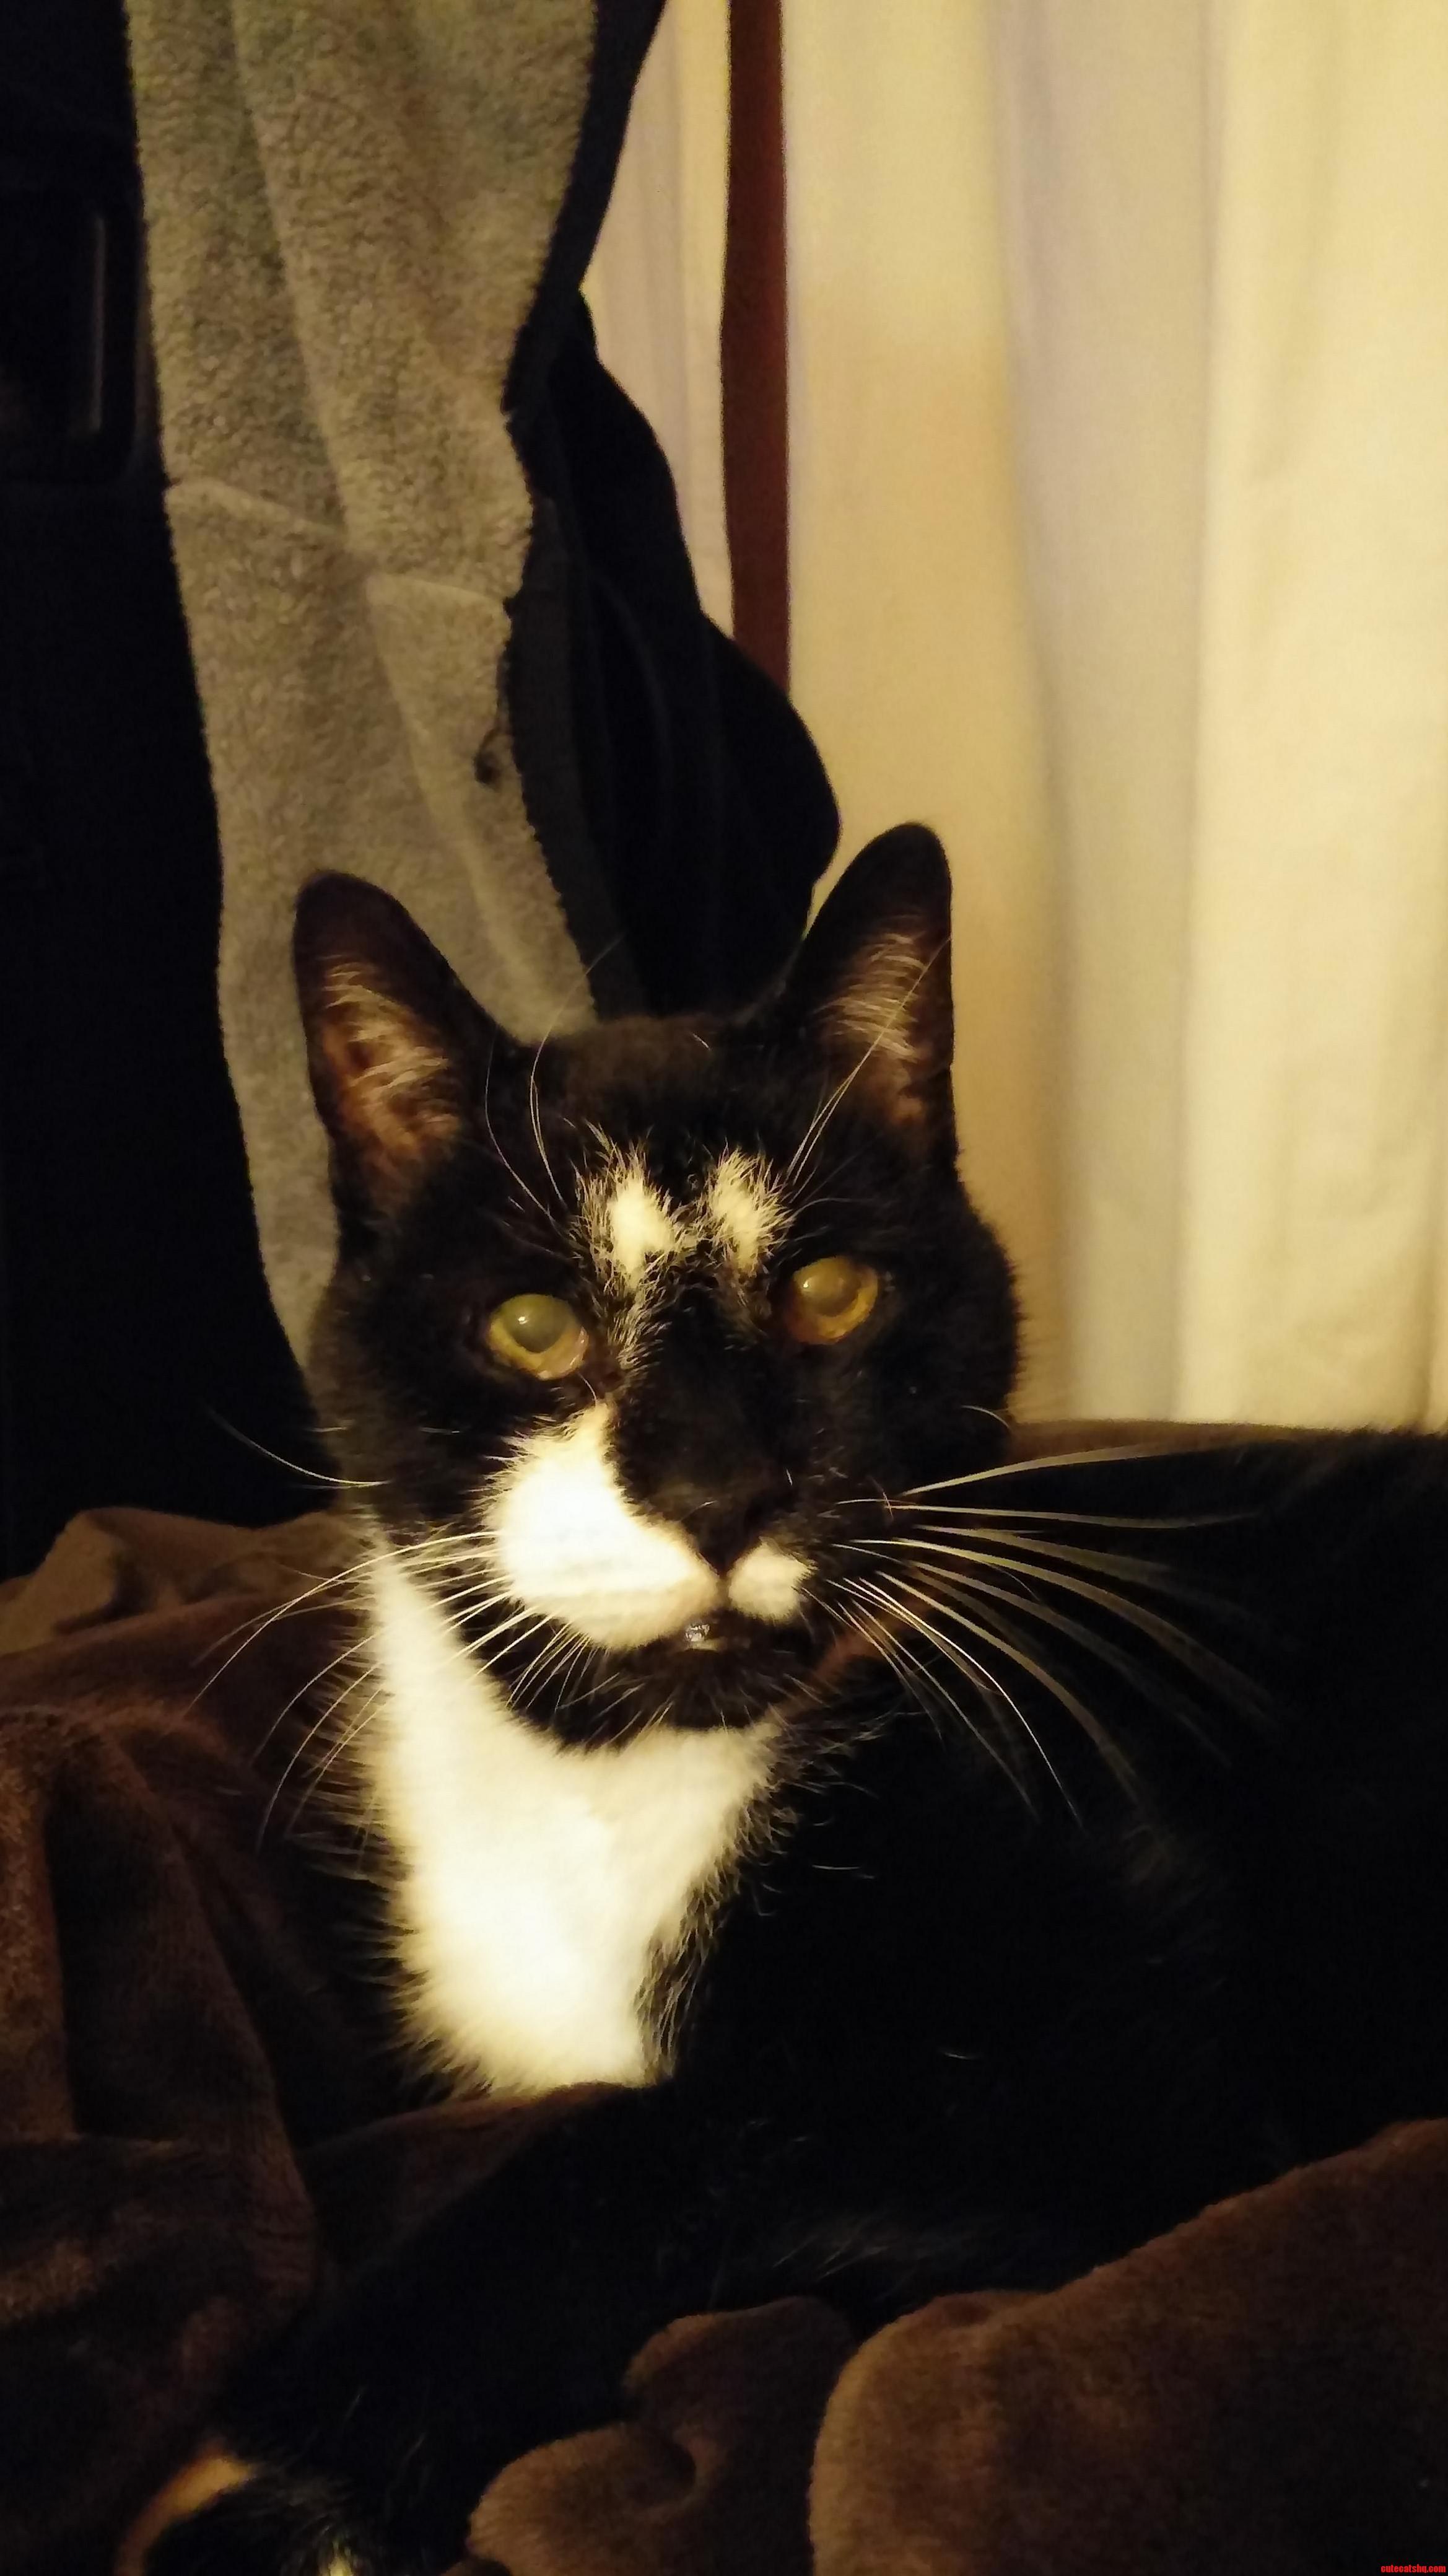 My boy milo. he just turned 15